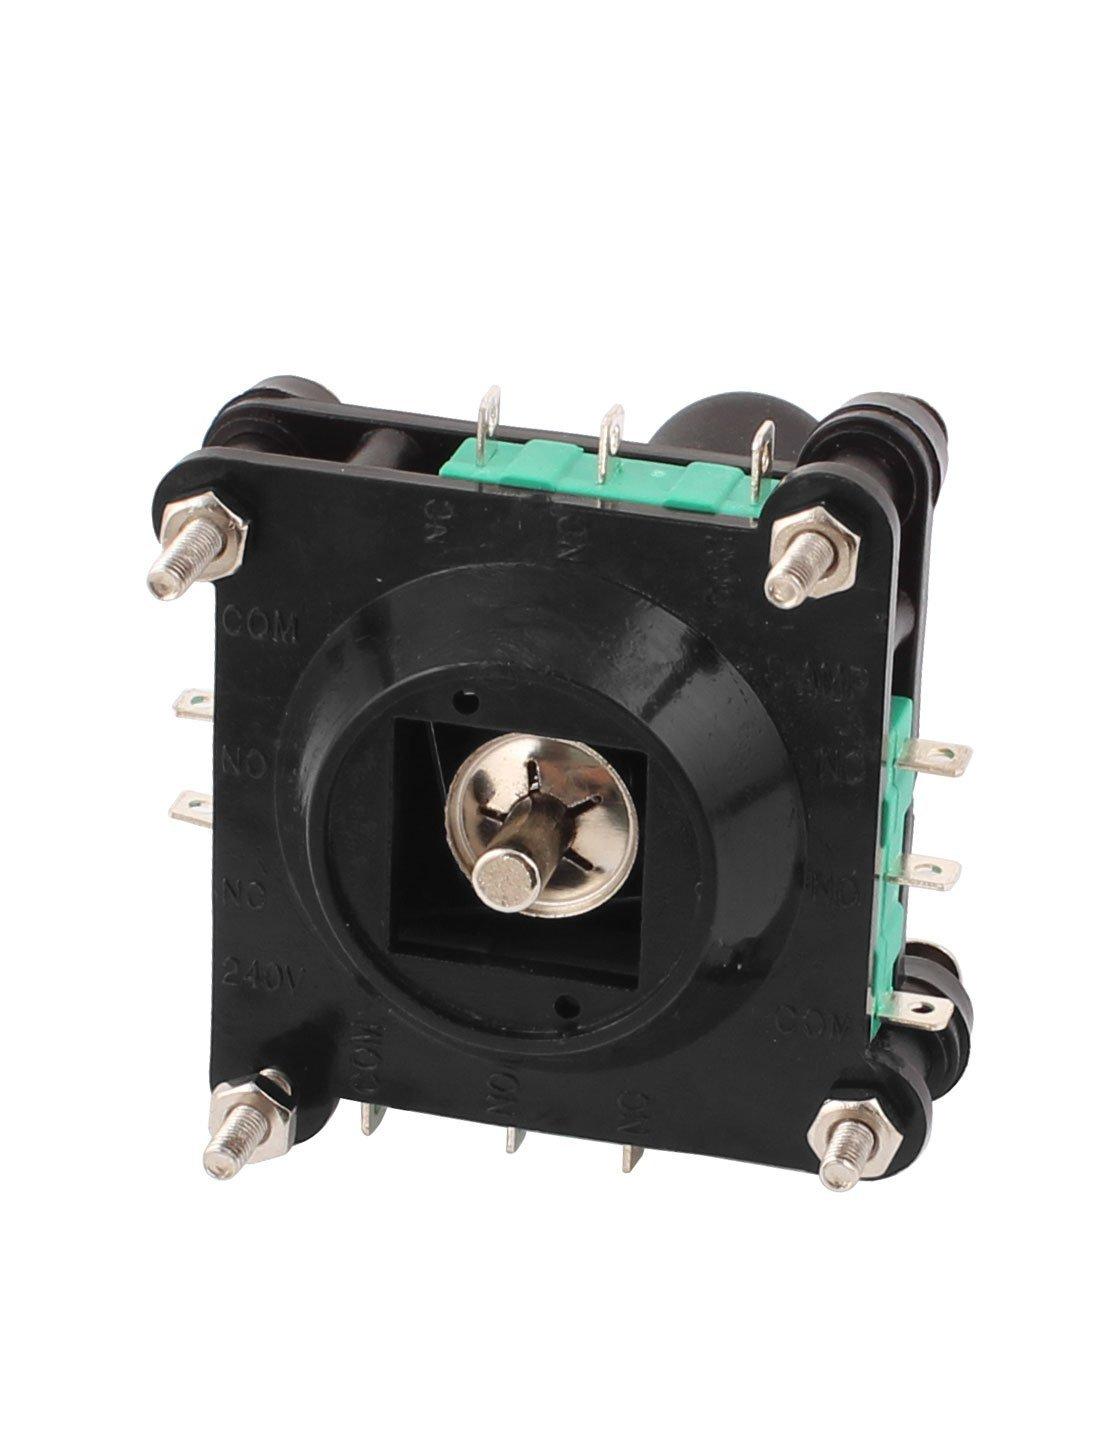 DealMux AC 240V 5Amp 4NO 4NC Momentary 2,5 mm Gewinde Joystick-Schalter